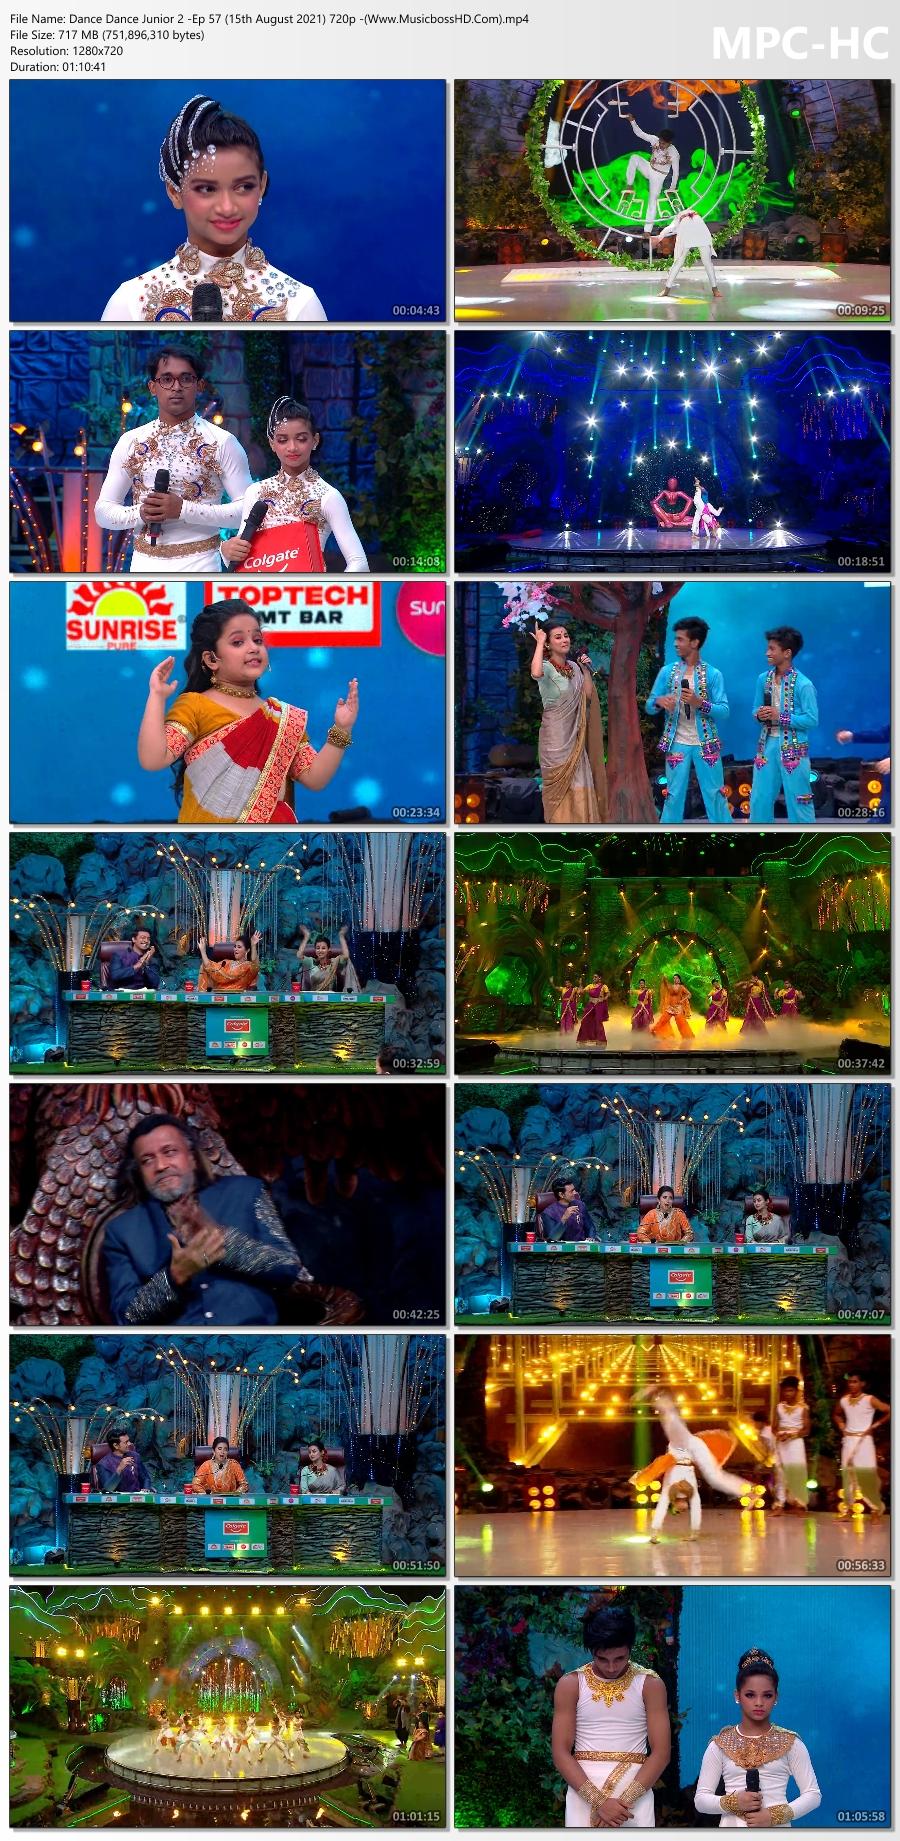 Dance-Dance-Junior-2-Ep-57-15th-August-2021-720p-Www-Musicboss-HD-Com-mp4-thumbs